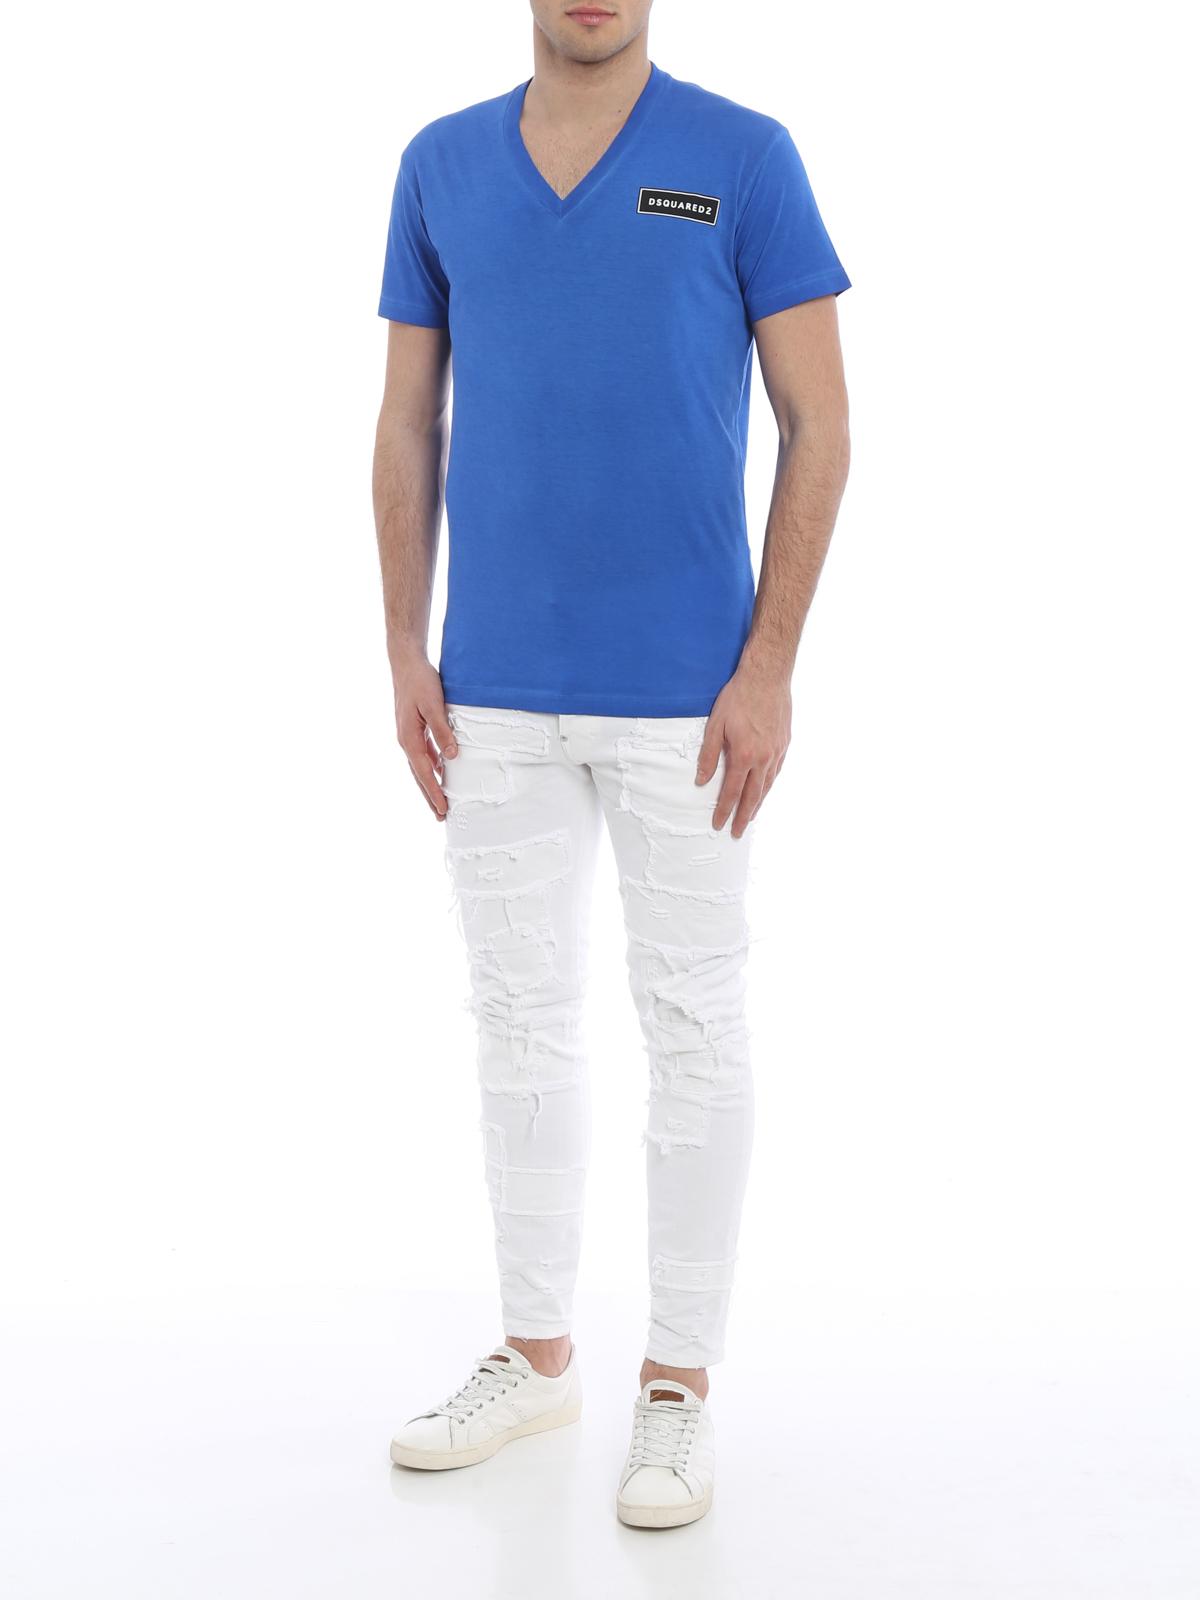 V neck cotton t shirt by dsquared2 t shirts ikrix for V neck t shirt online shopping